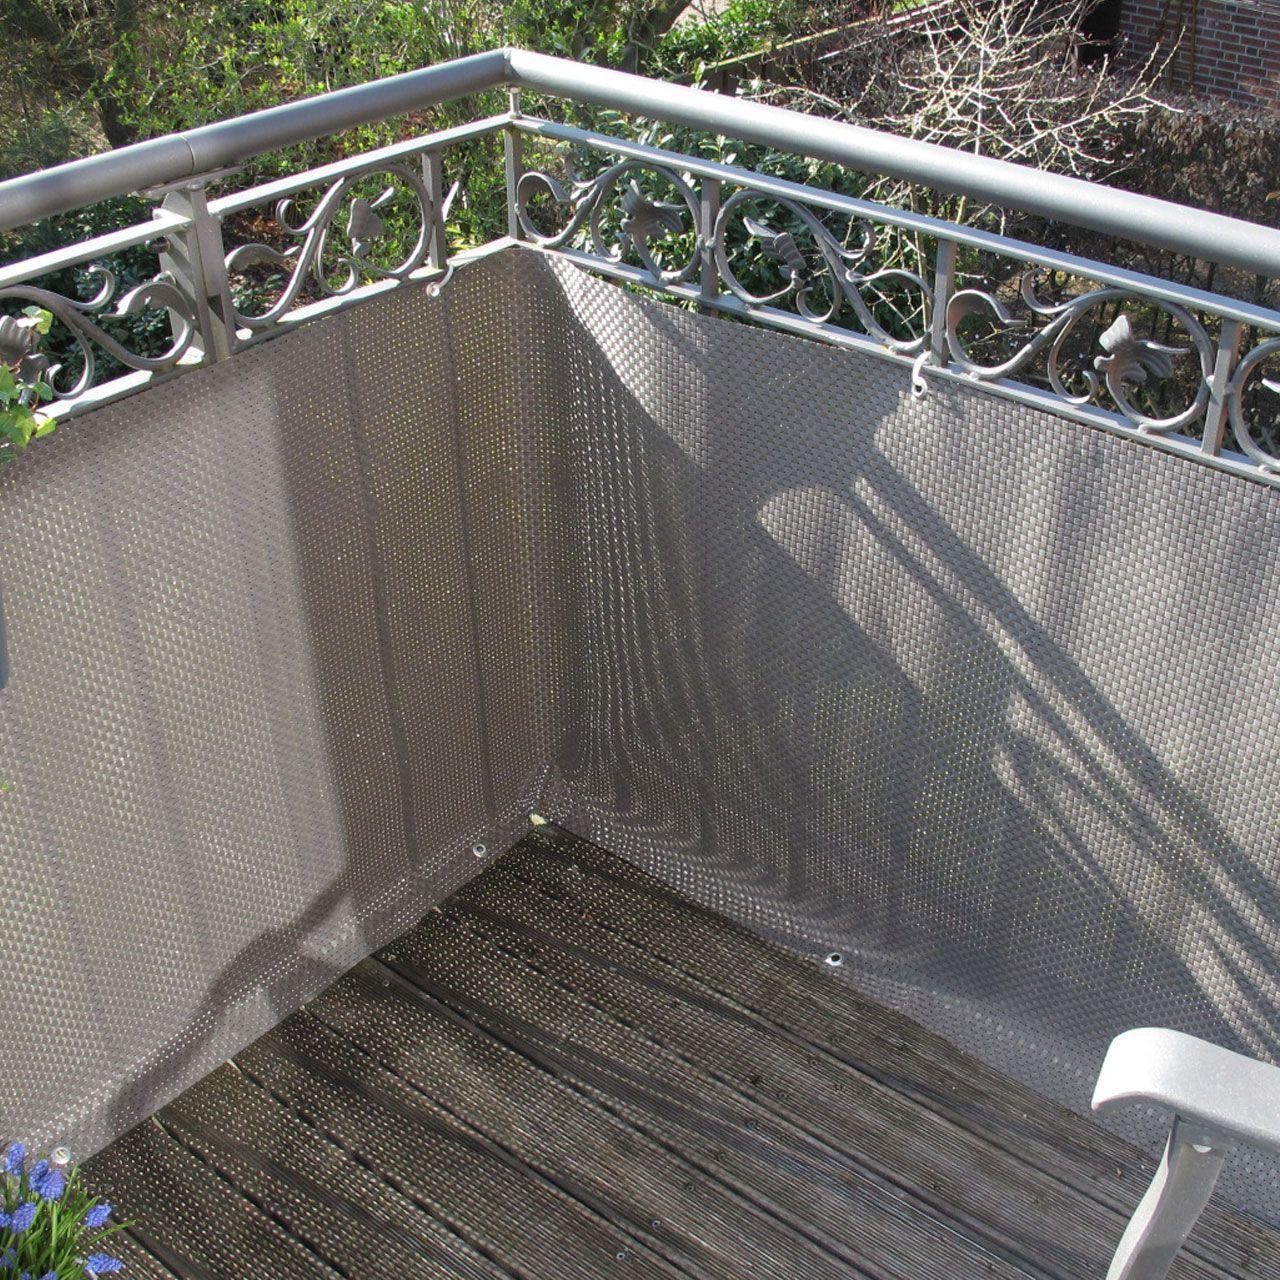 Balkonverkleidung Kunststoffgeflecht, titangrau in 2020